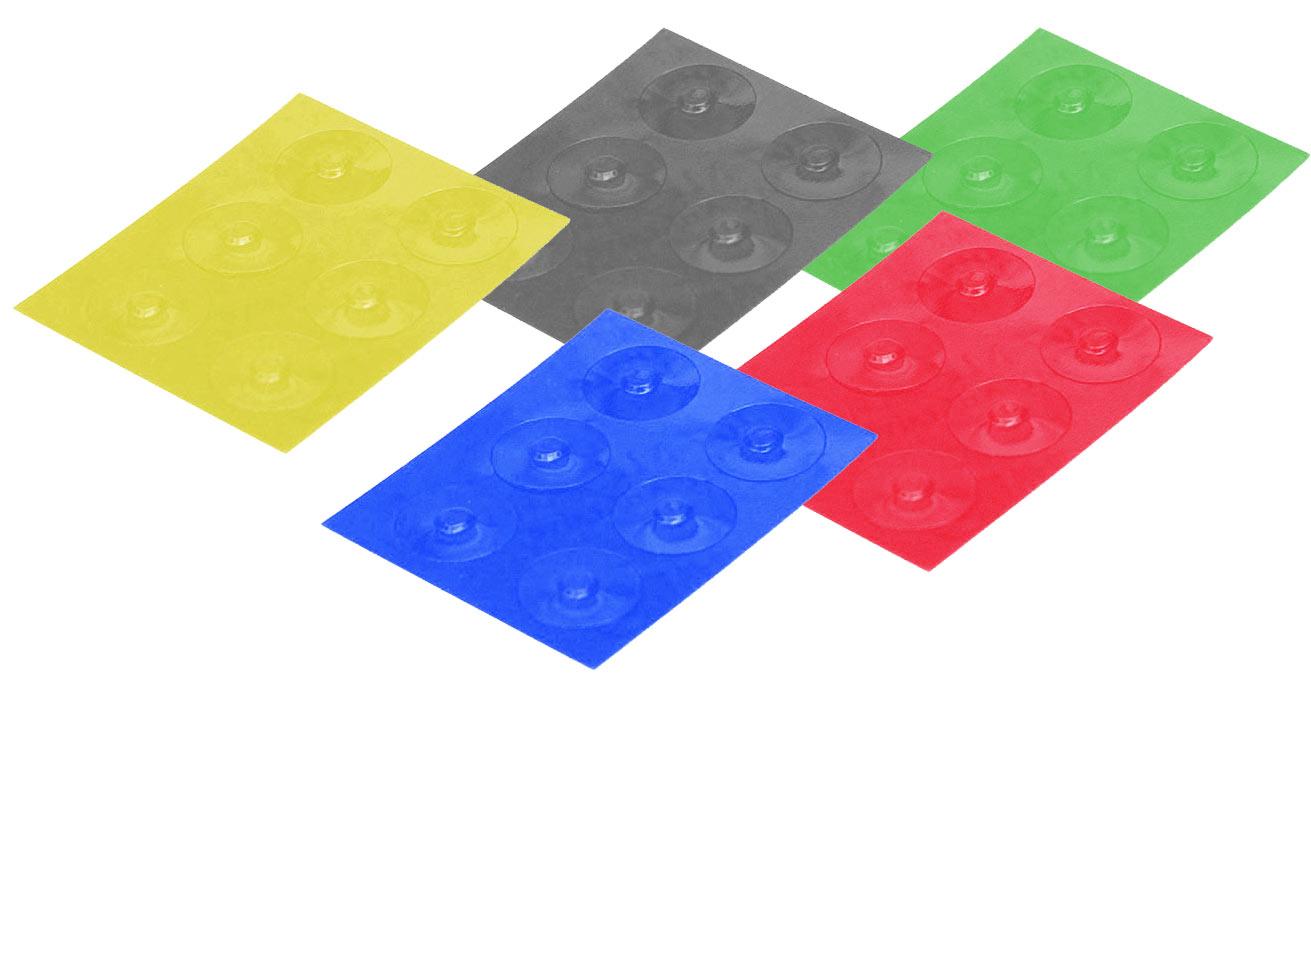 Color-Dots Tactile Key Locators - Set of 30 - 6 of each color